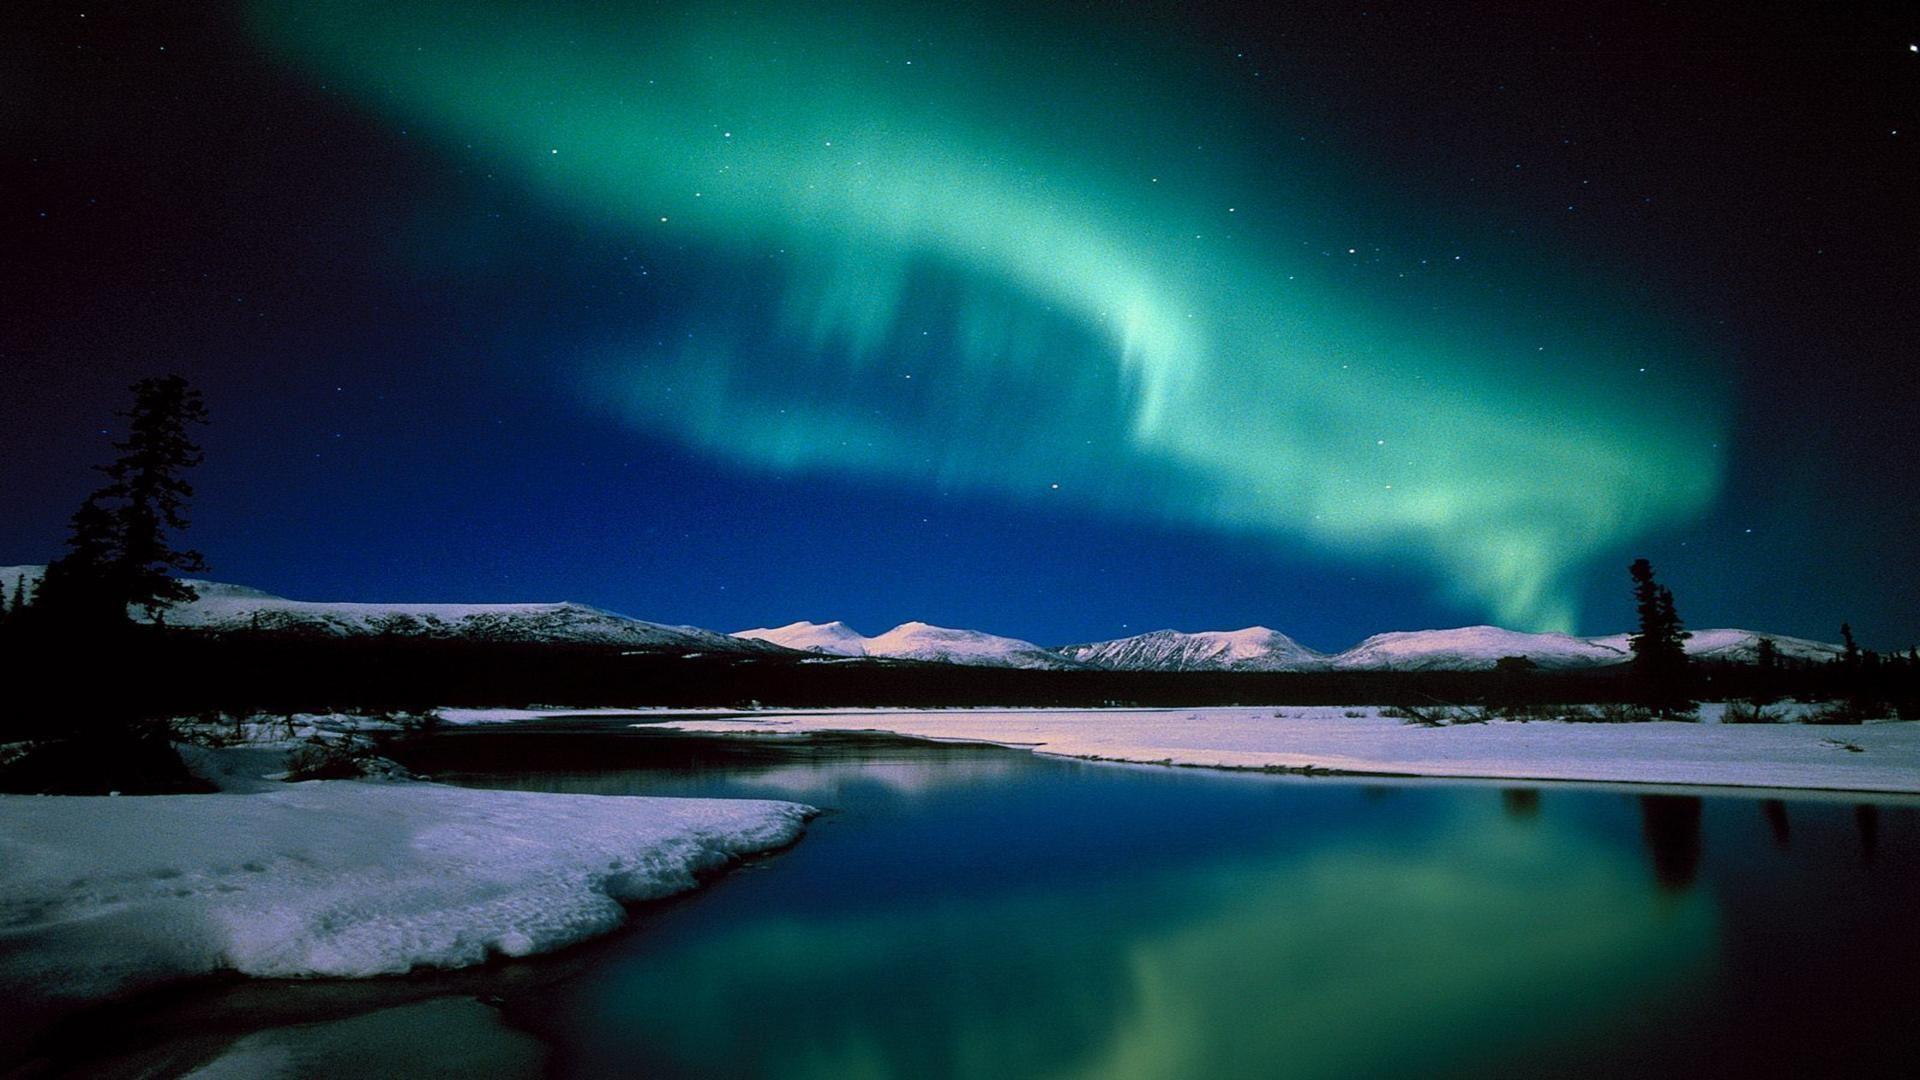 Aurora Borealis Wallpaper Desktop | wallpaper, wallpaper hd ...